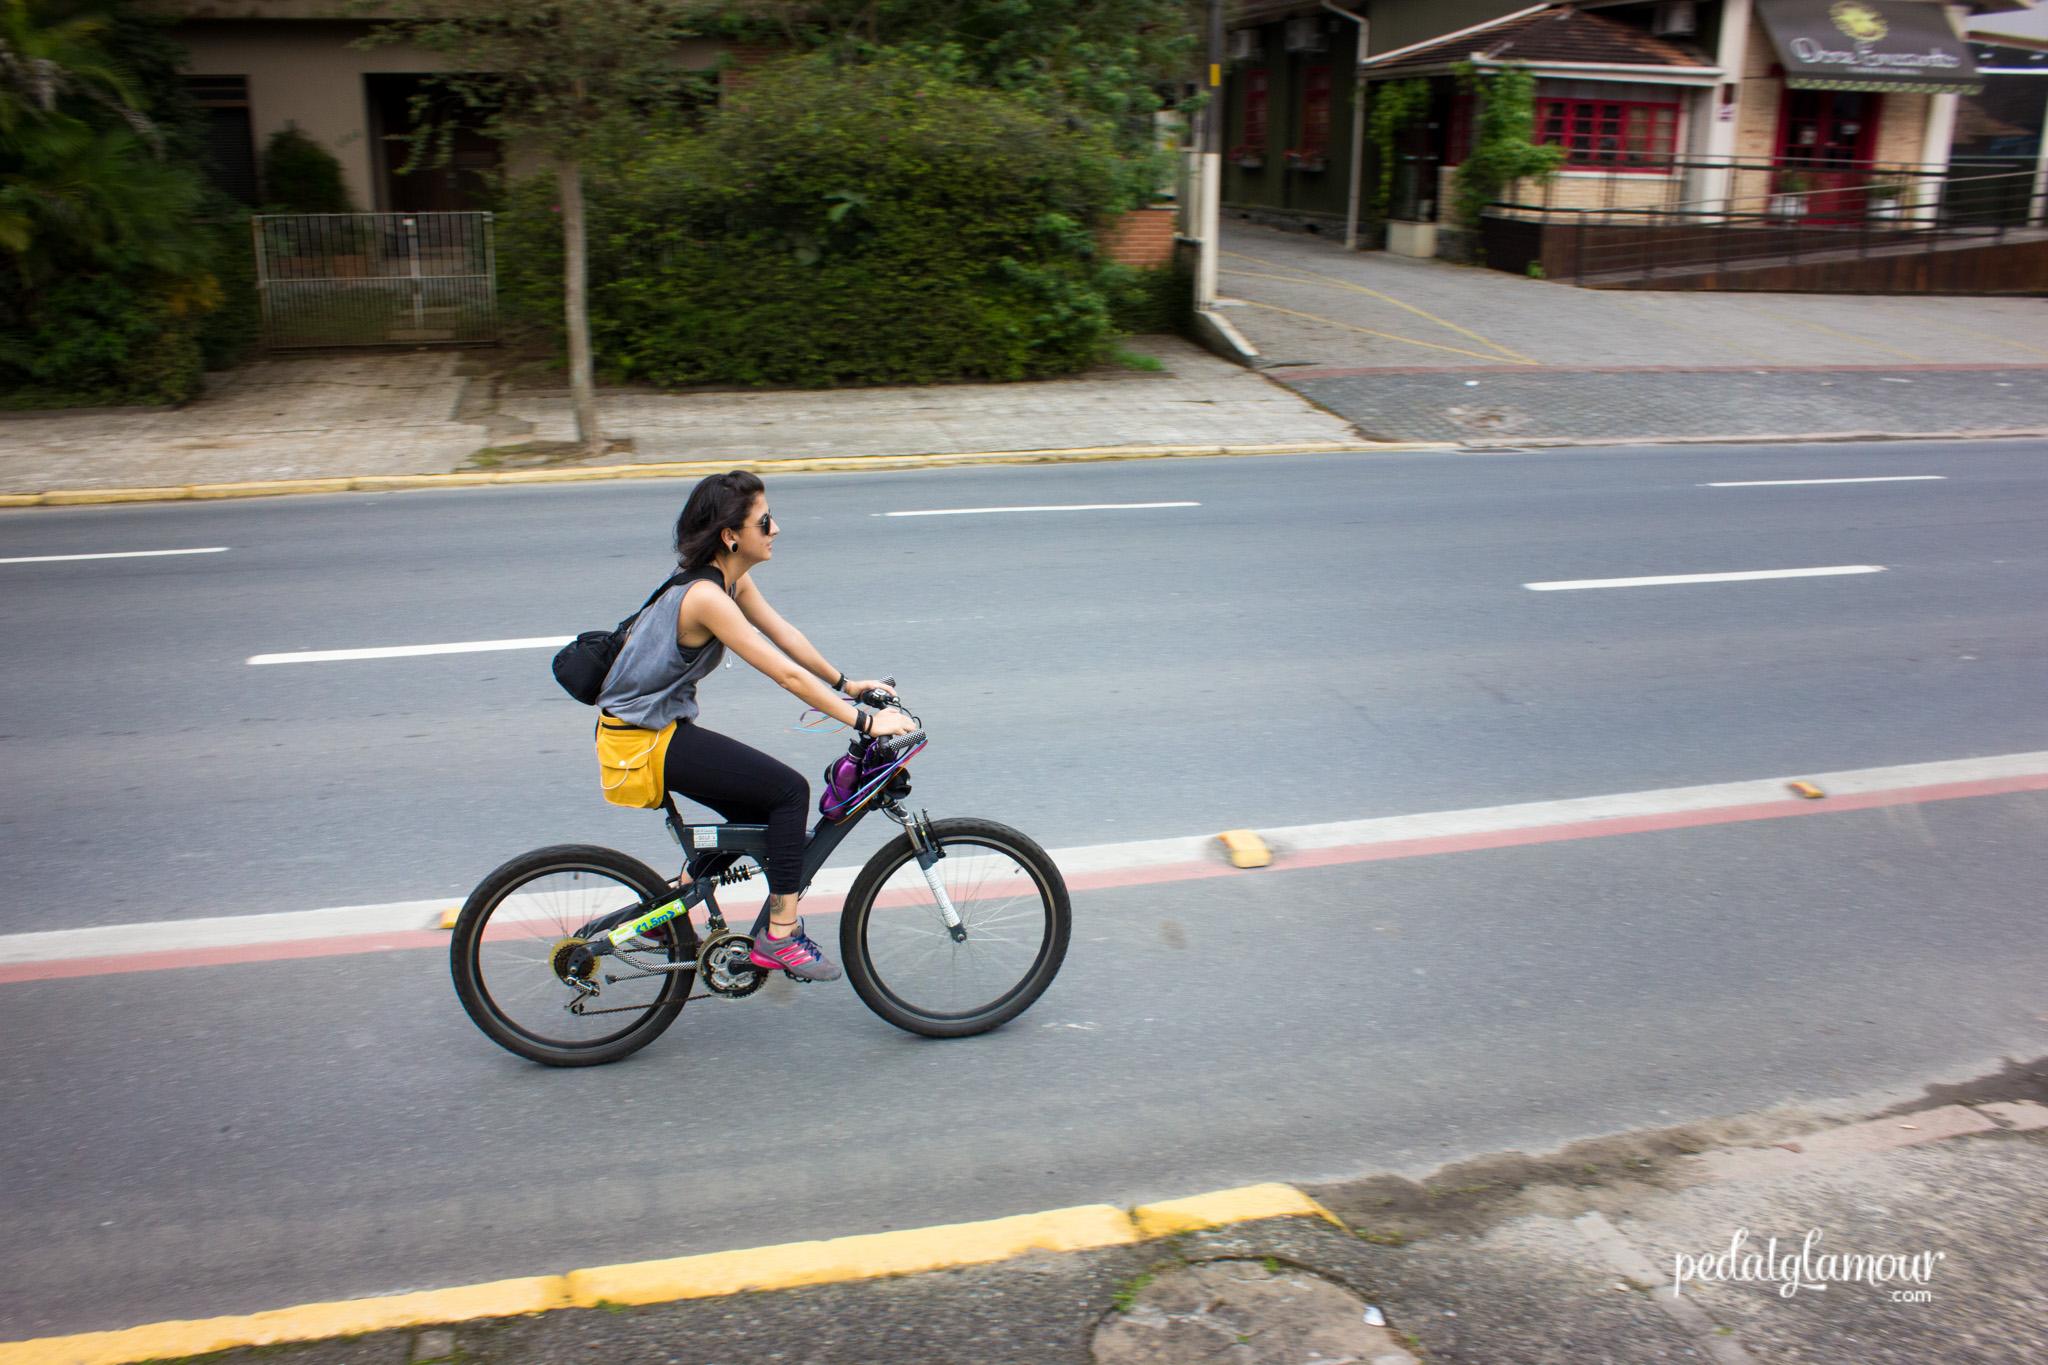 PedalGlamour@JoinvilleAgain-21